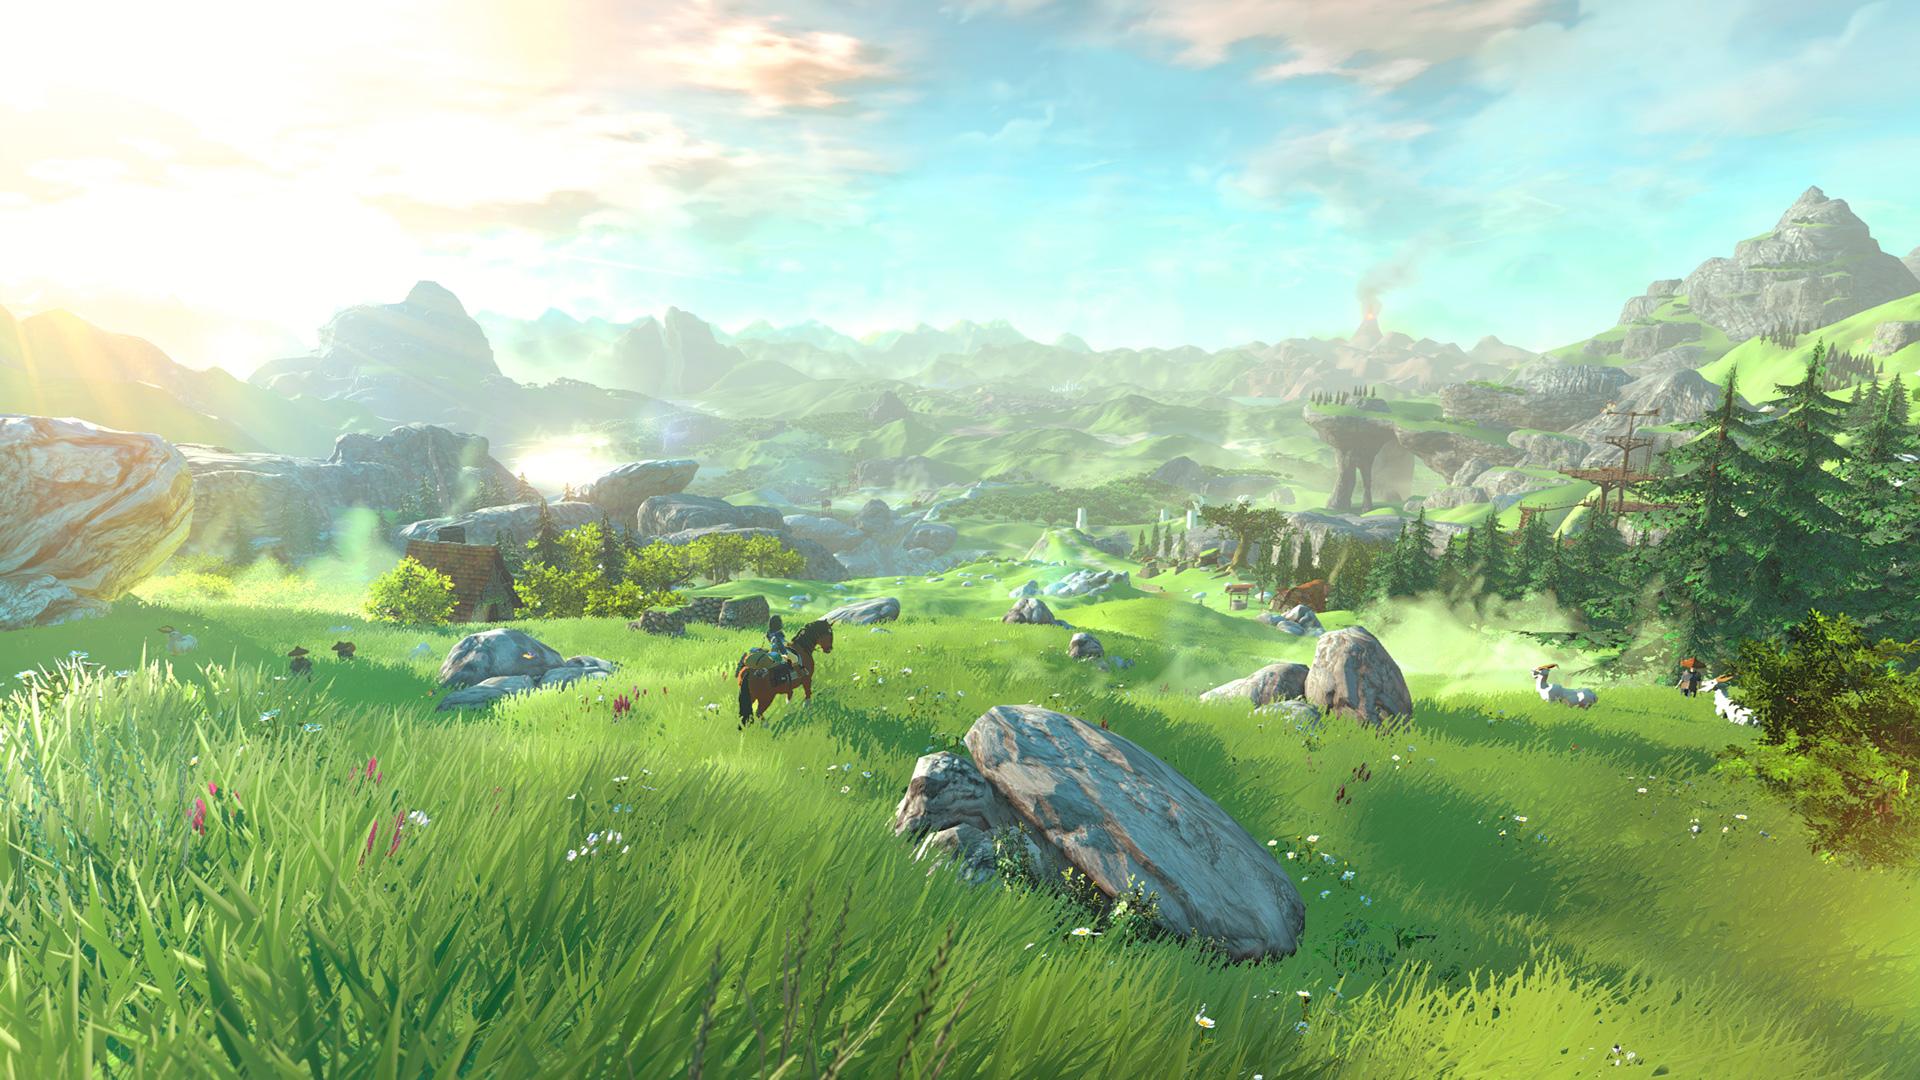 Legend Of Zelda Wii U 1080p Screenshots Game Usagi 1920x1080